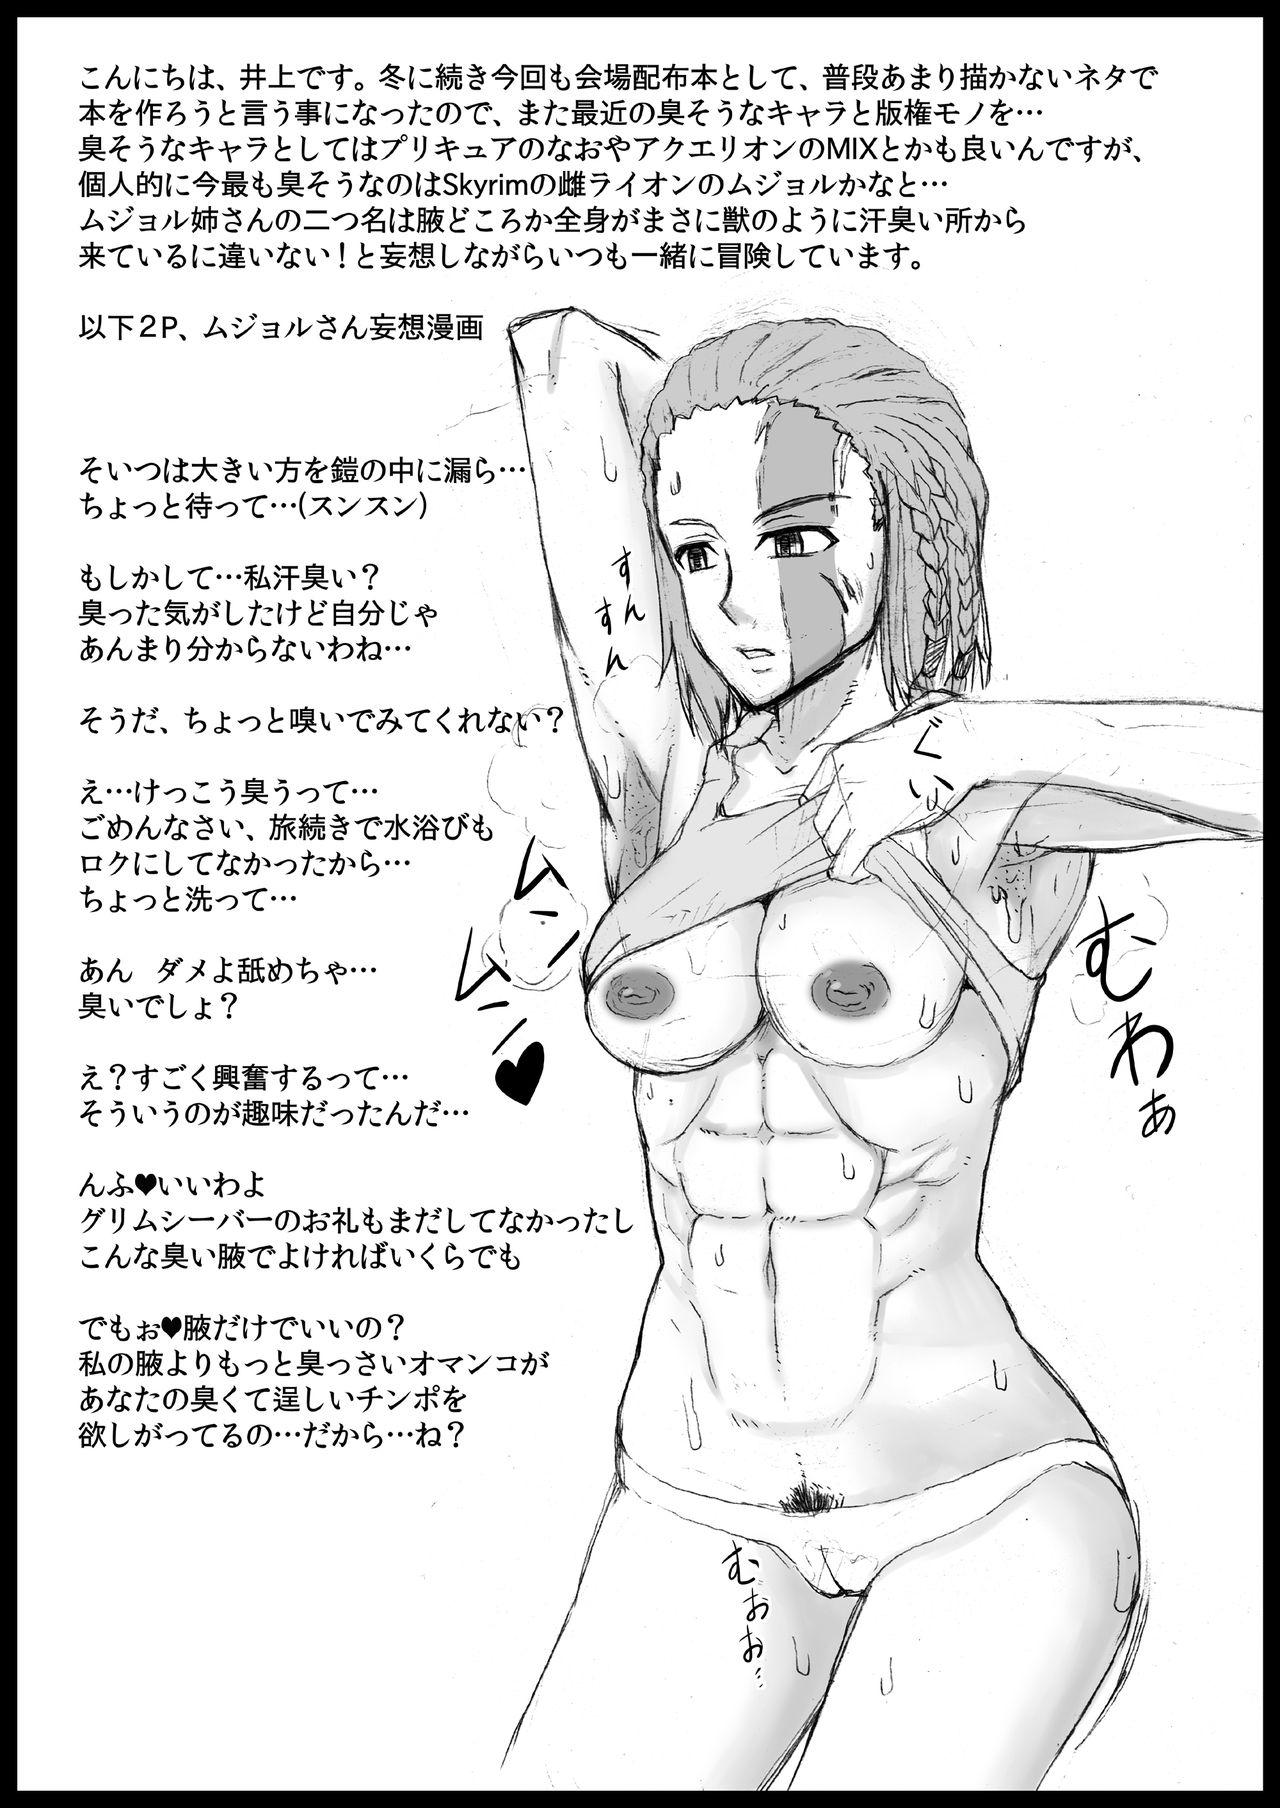 Kusurizuke! Sennou! Kikai Kaizou! Kuroochi Bitch-ka Heroine +α 207